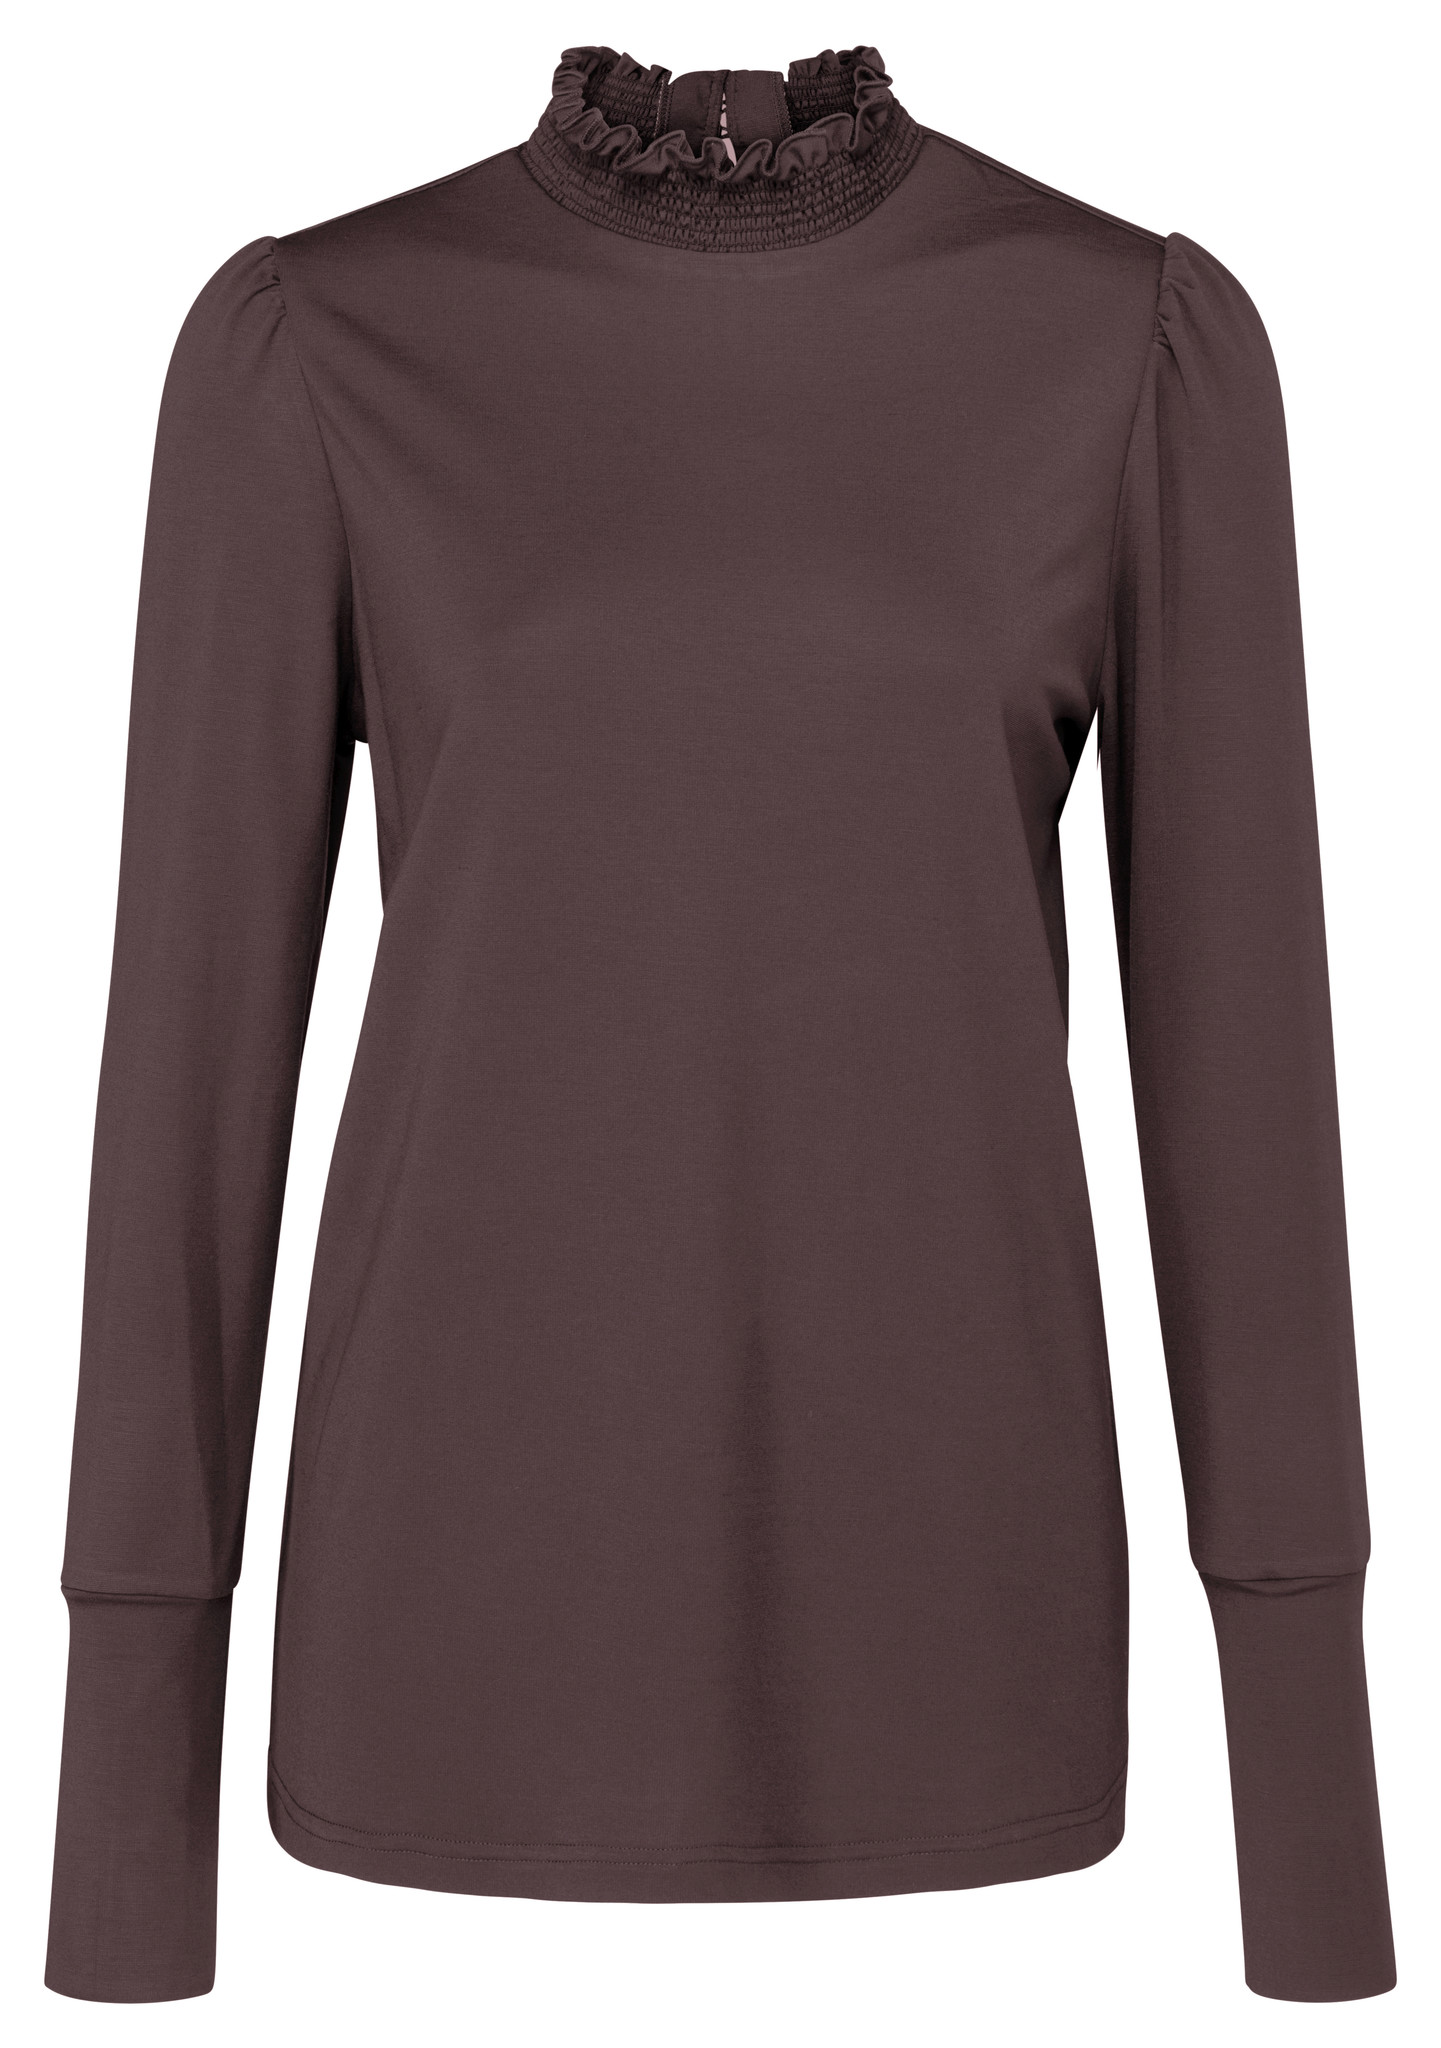 yaya Jersey top with smoc 1909491-124-1